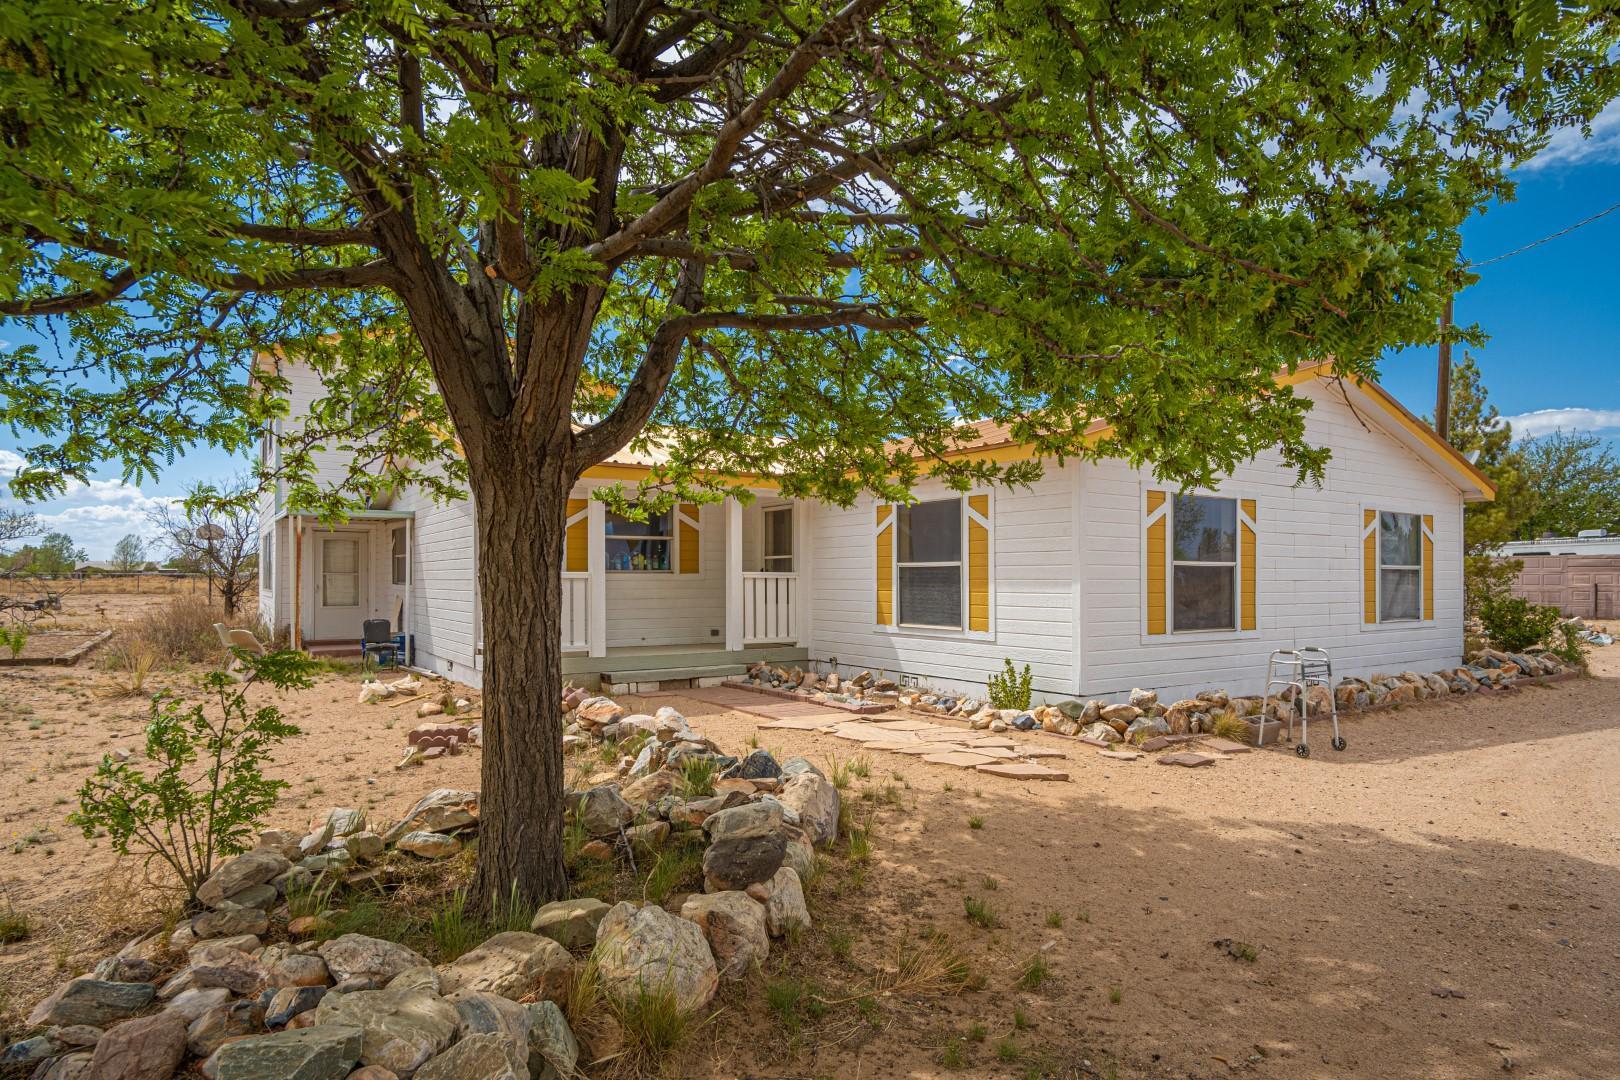 38 CAMPBELL Court, Los Lunas NM 87031